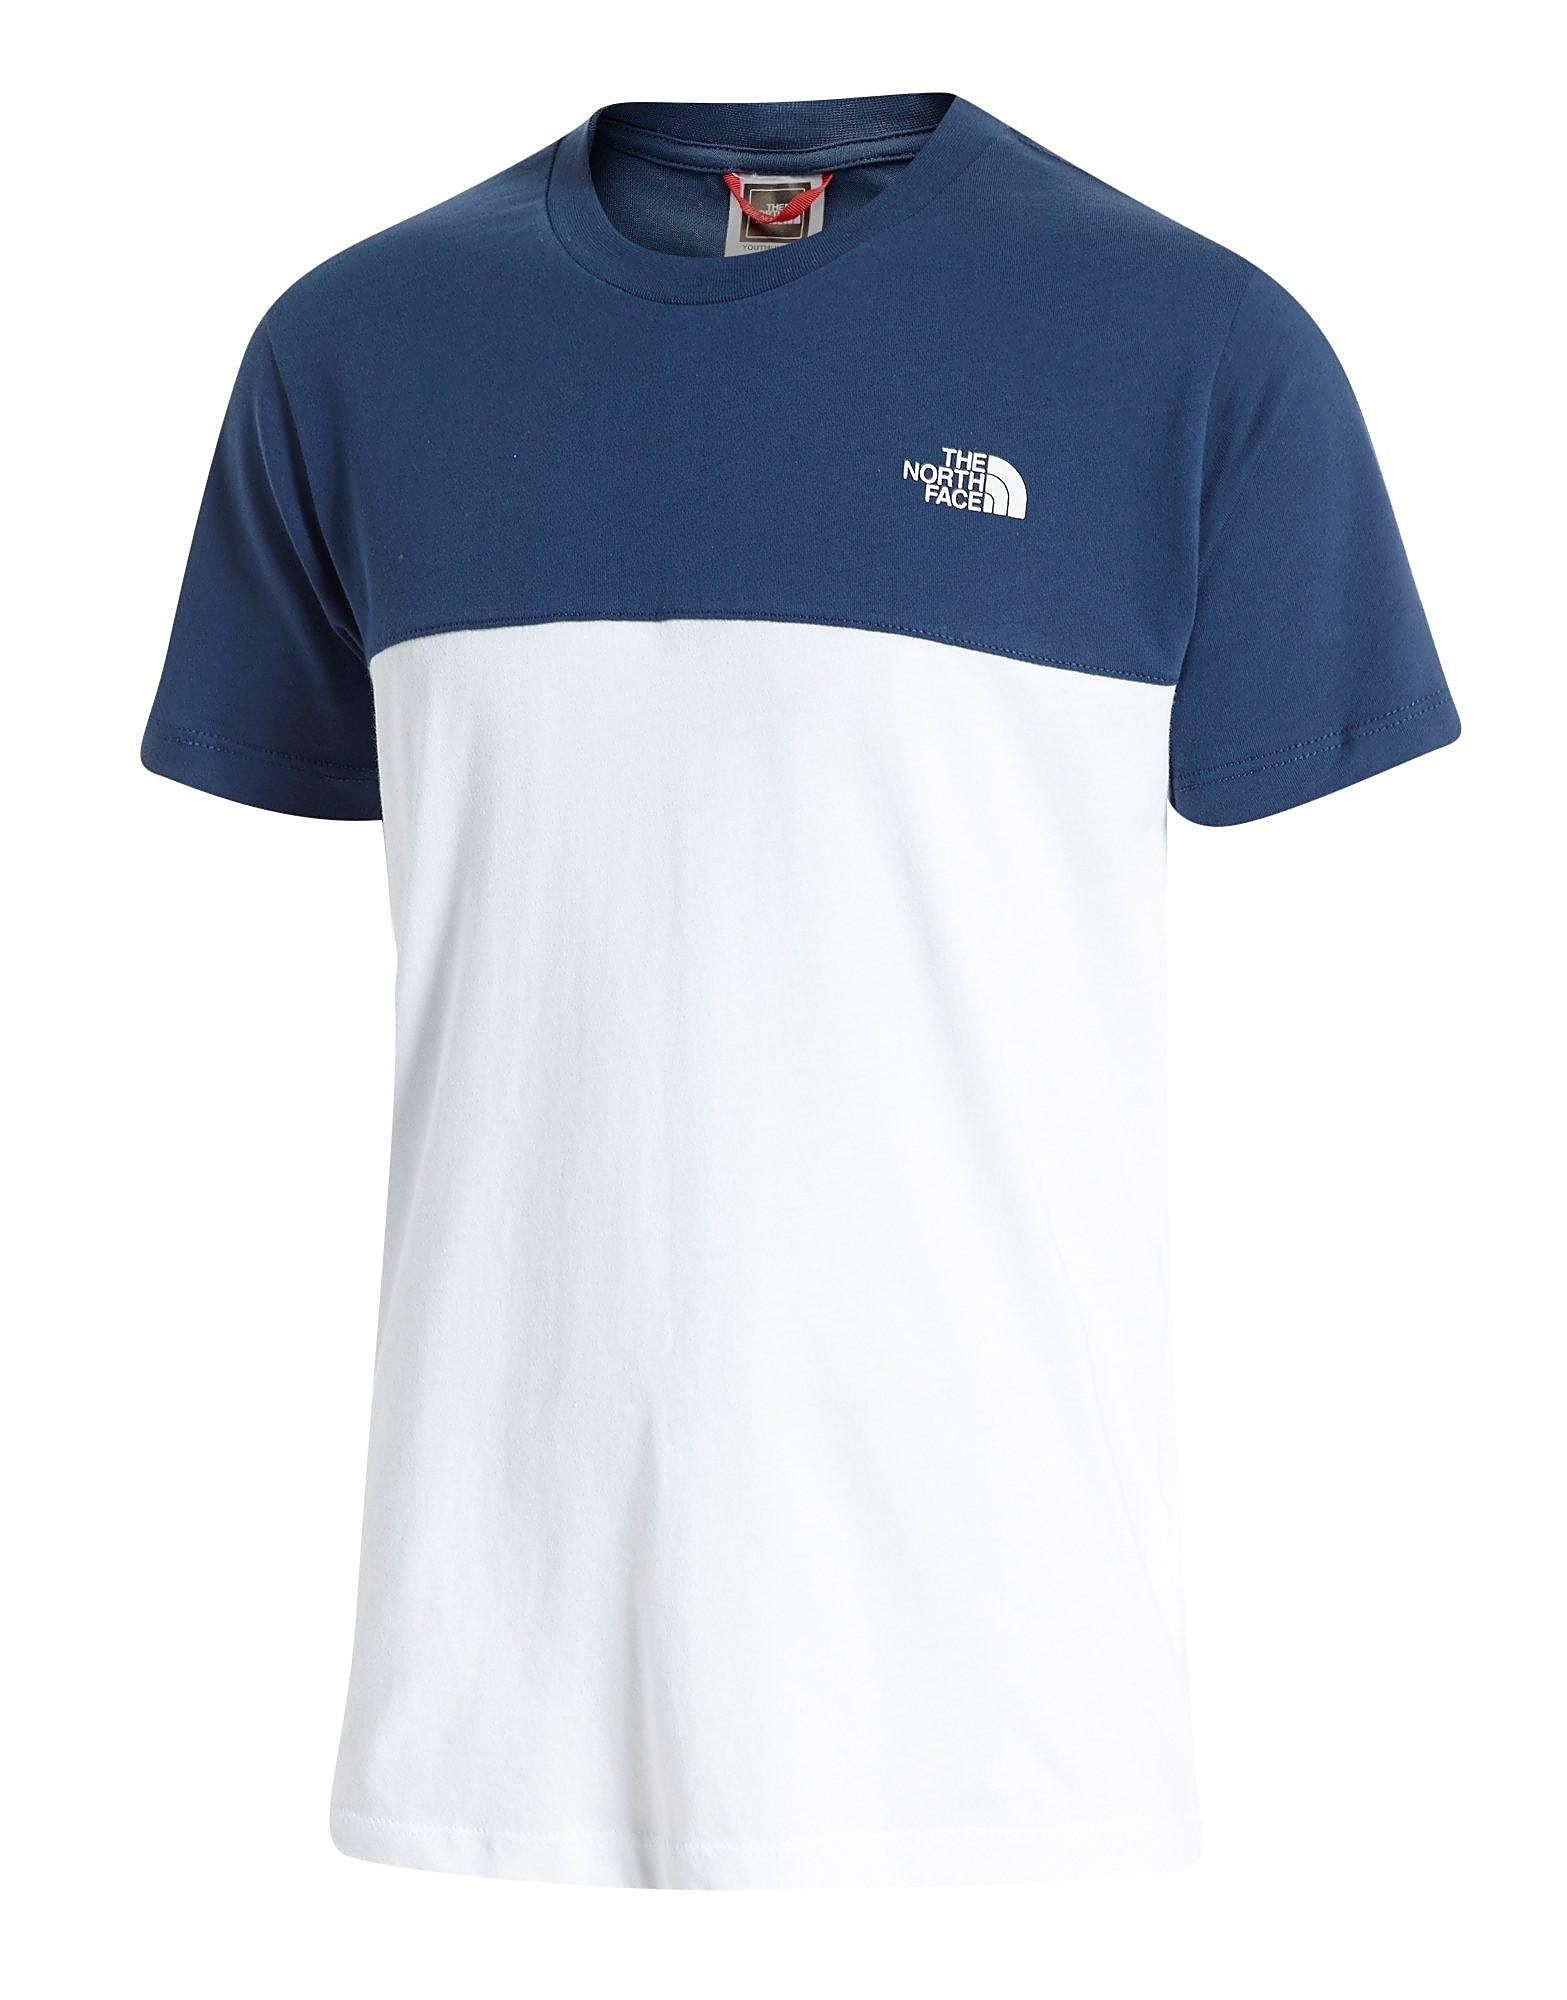 The North Face Colour Block T-Shirt Junior